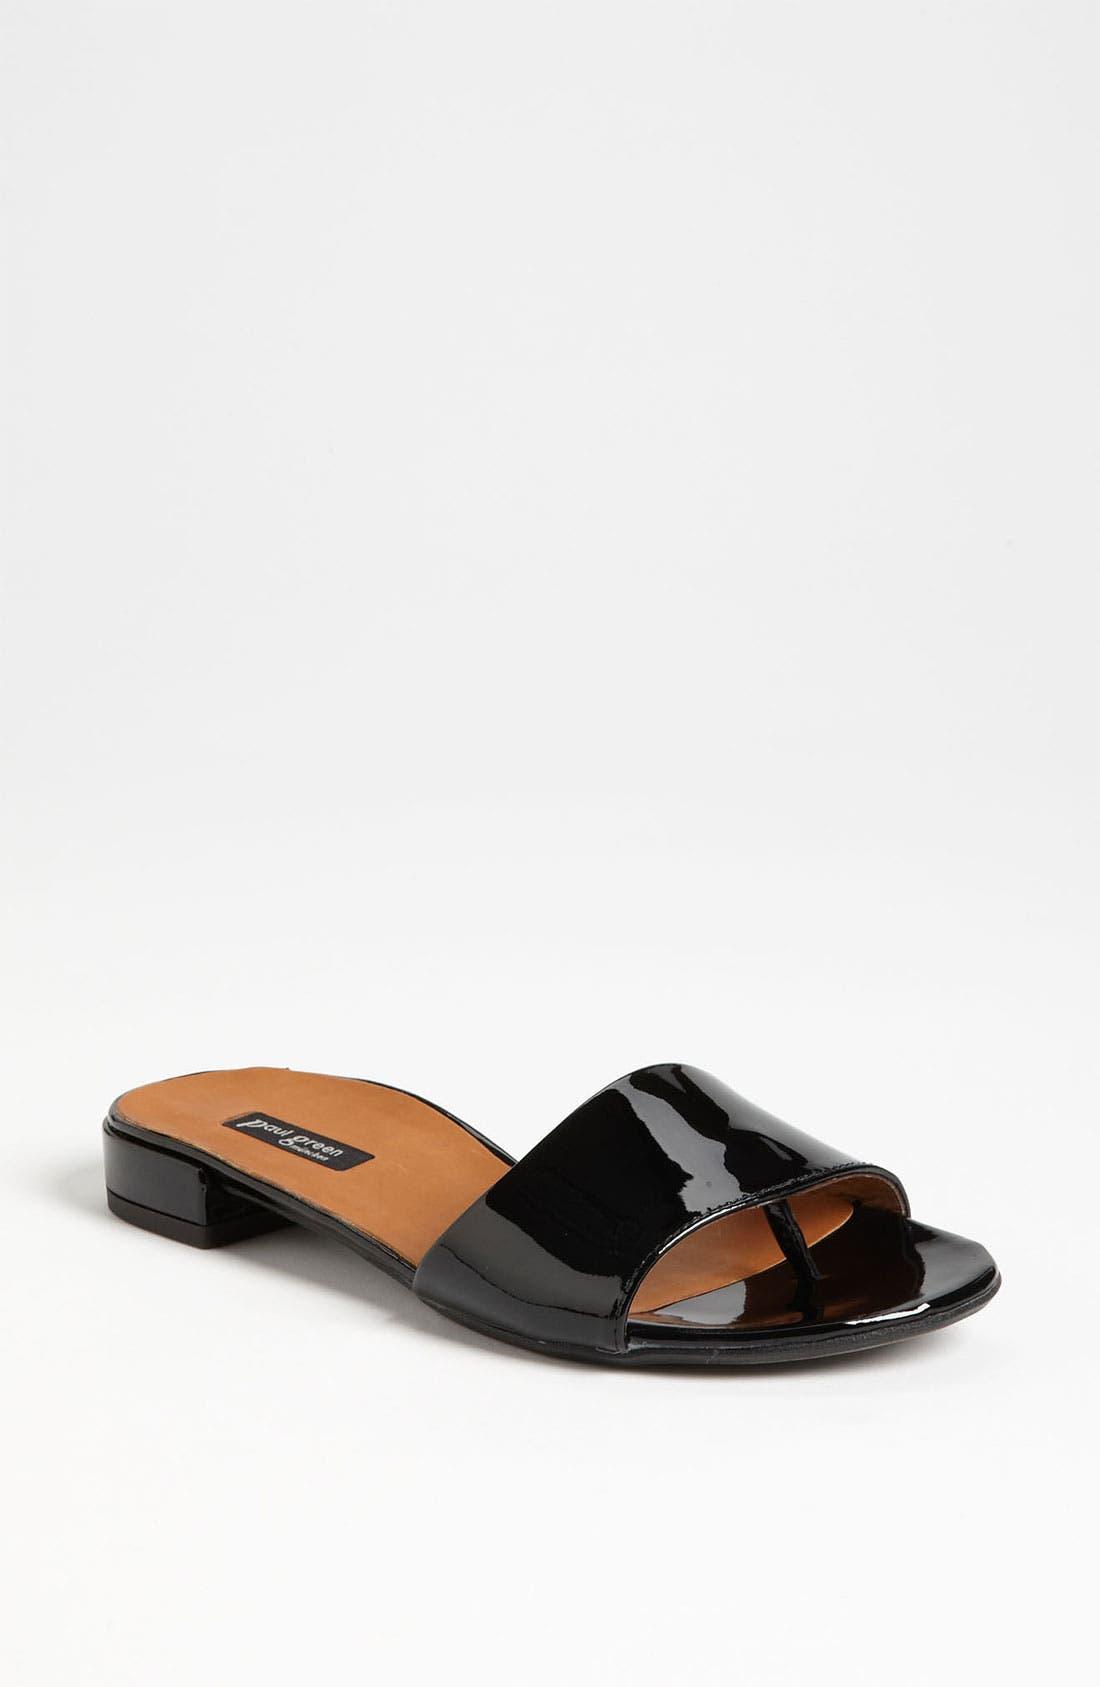 Alternate Image 1 Selected - Paul Green 'Nuevo' Sandal